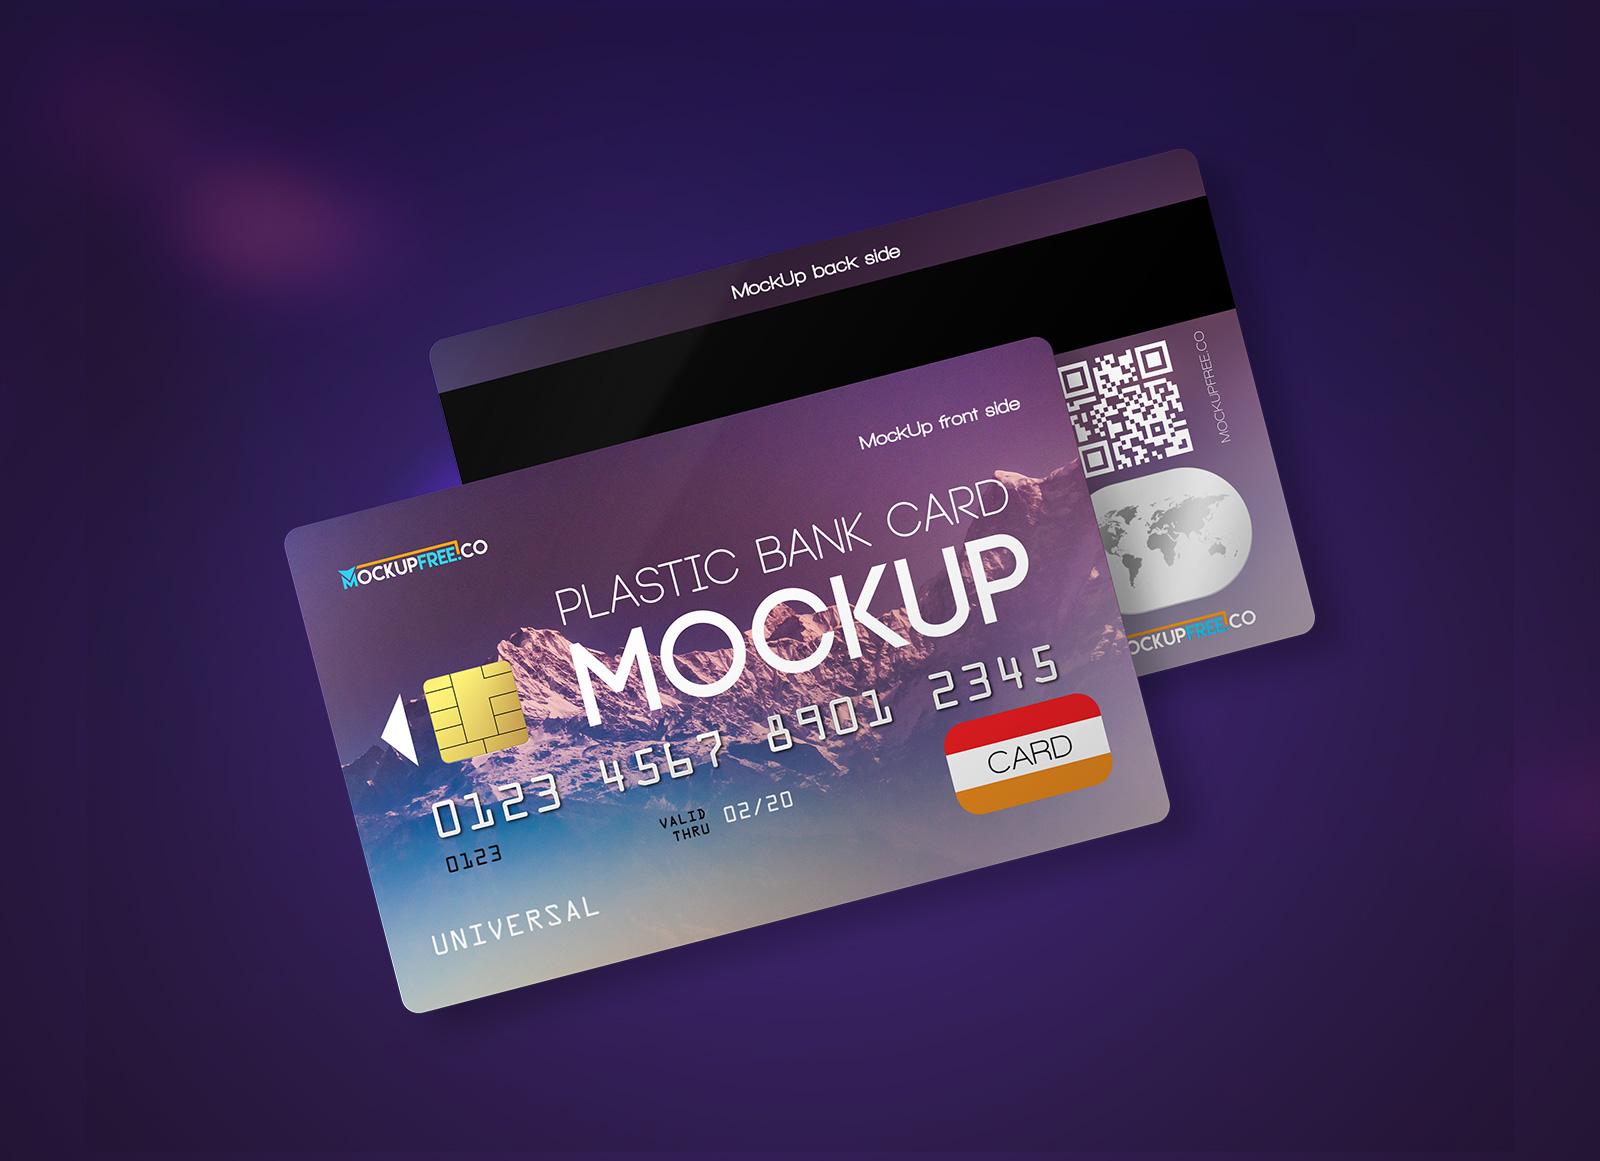 Free-Credit-Debit-Bank-Card-Mockup-PSD